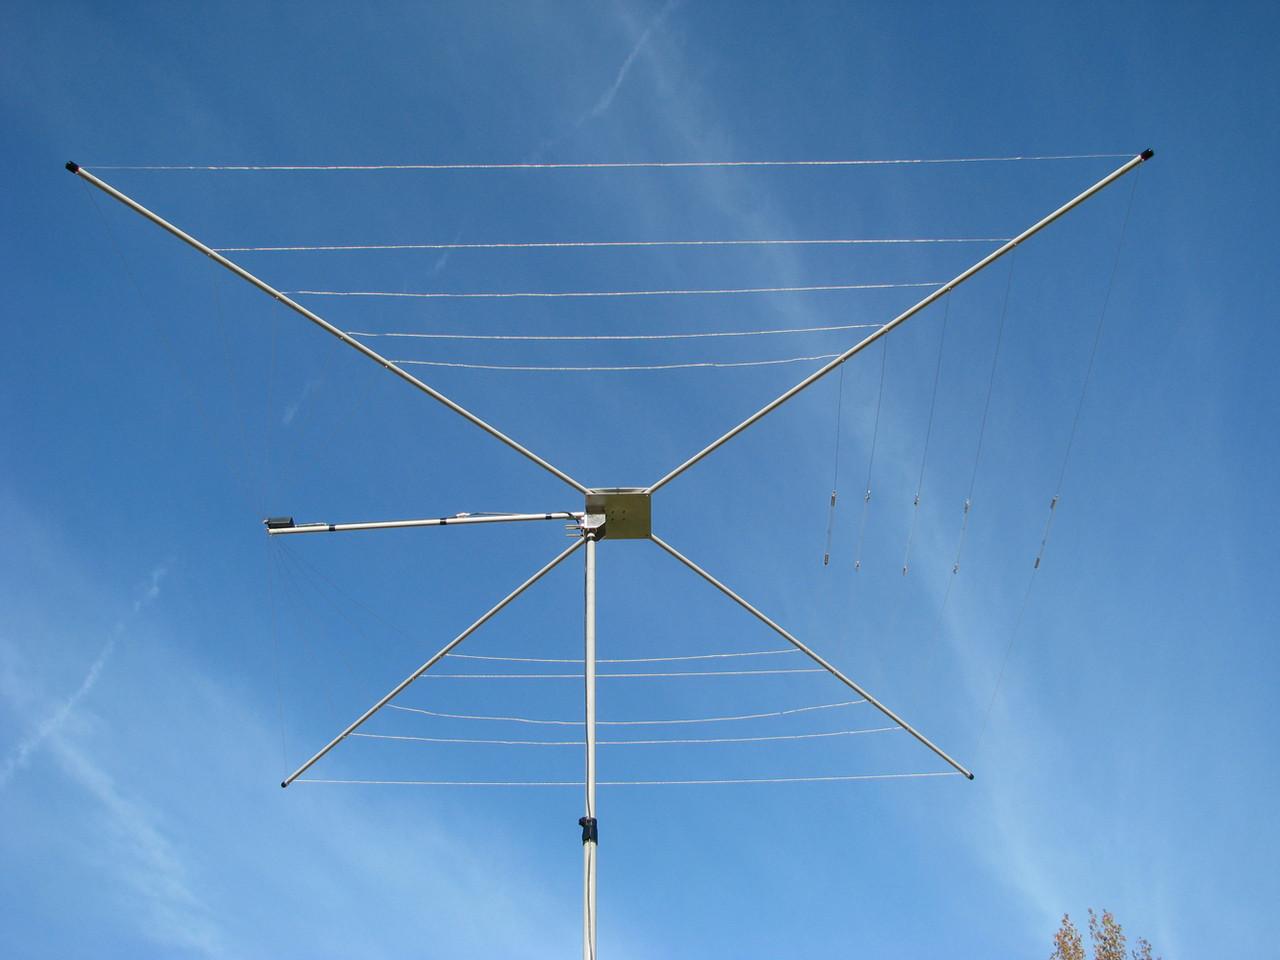 MFJ-1836H High Power 1500W HF Cob Web Antenna